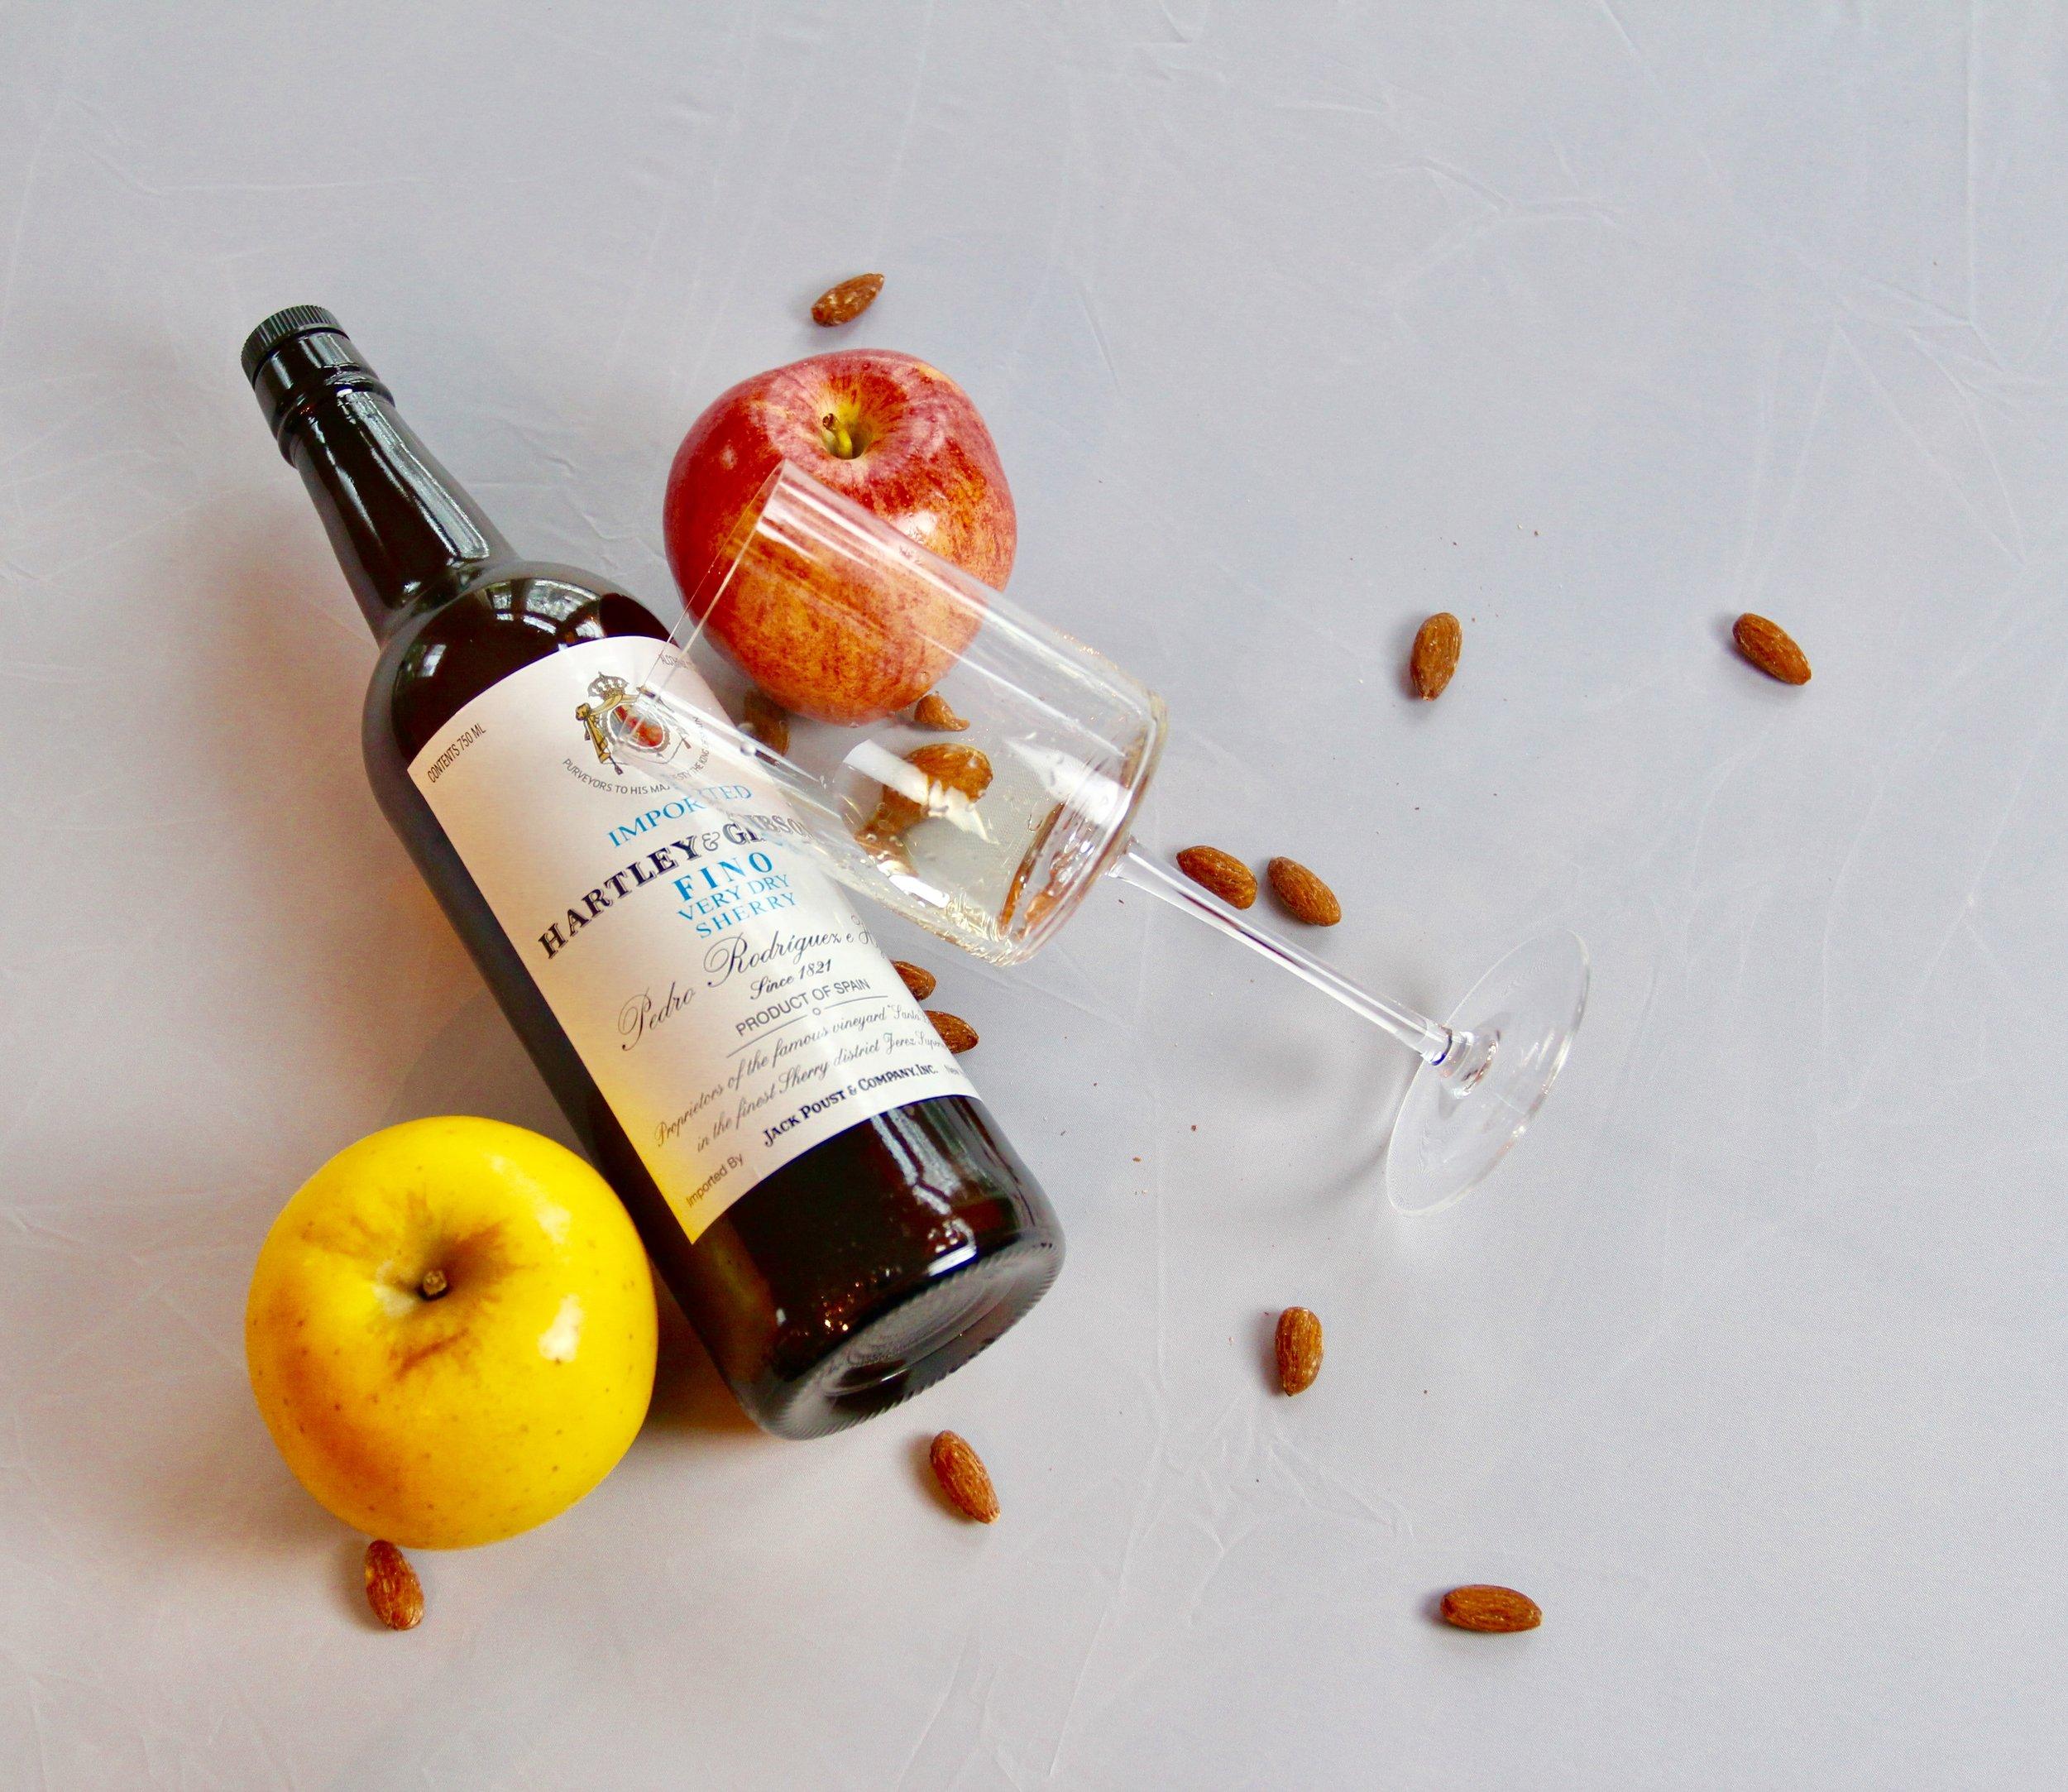 Hartley & Gibson's Fino Very Dry Sherry: $10